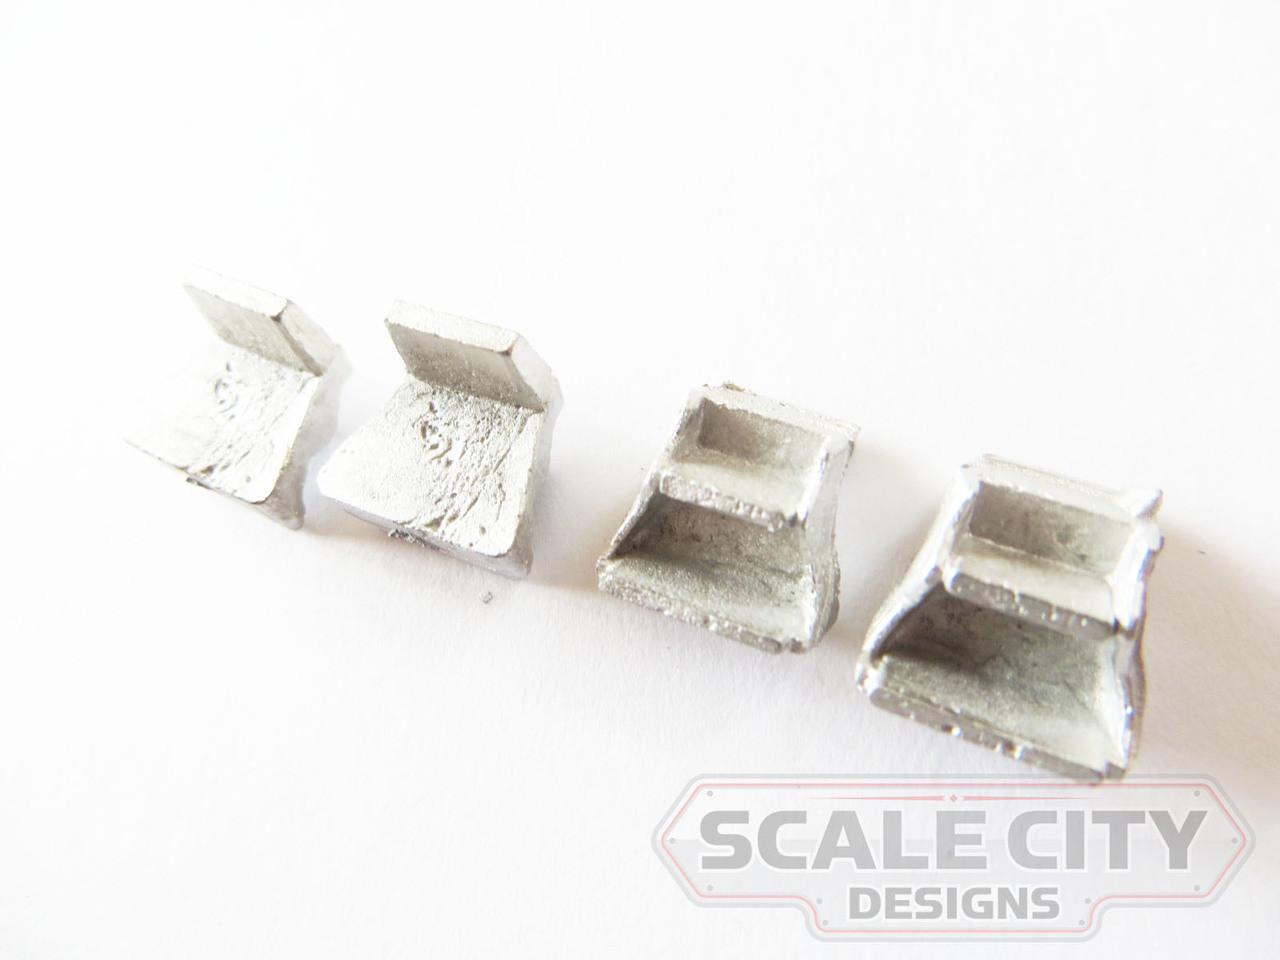 48-699 Caboose Steps Tender Style O Scale FKA Keil Line